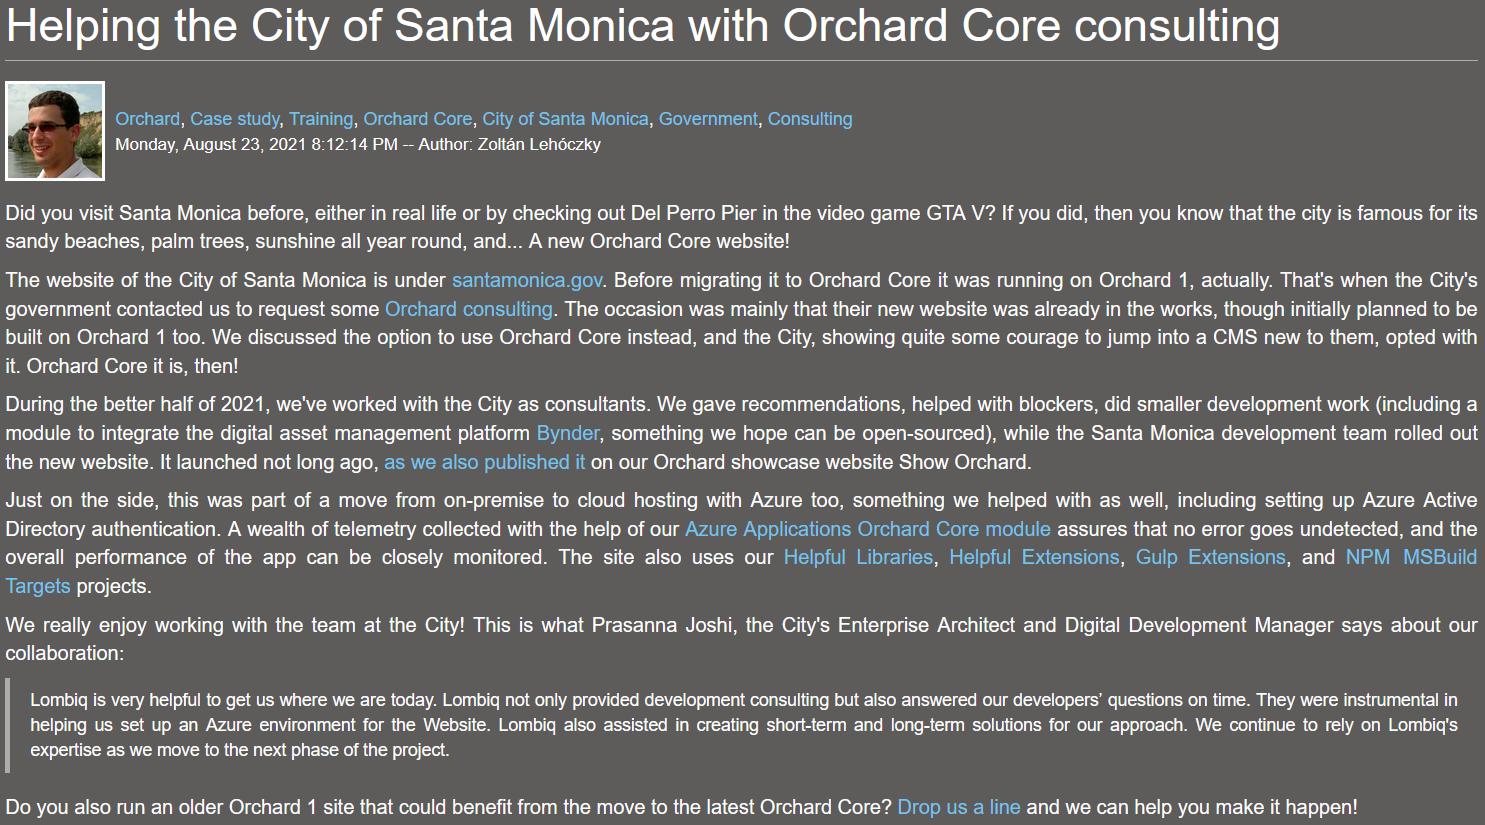 City of Santa Monica Orchard Core case study